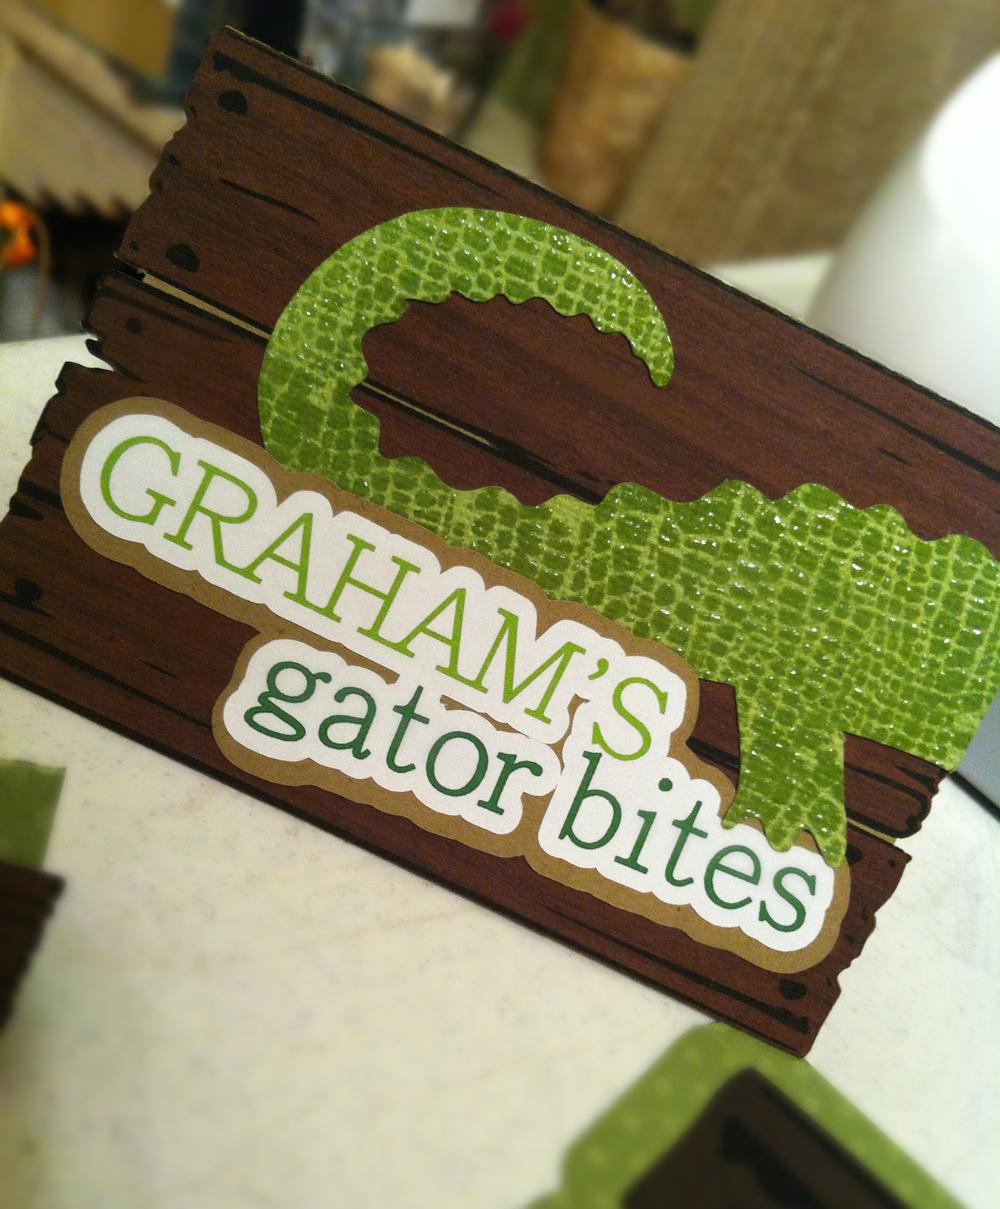 Gator Bites